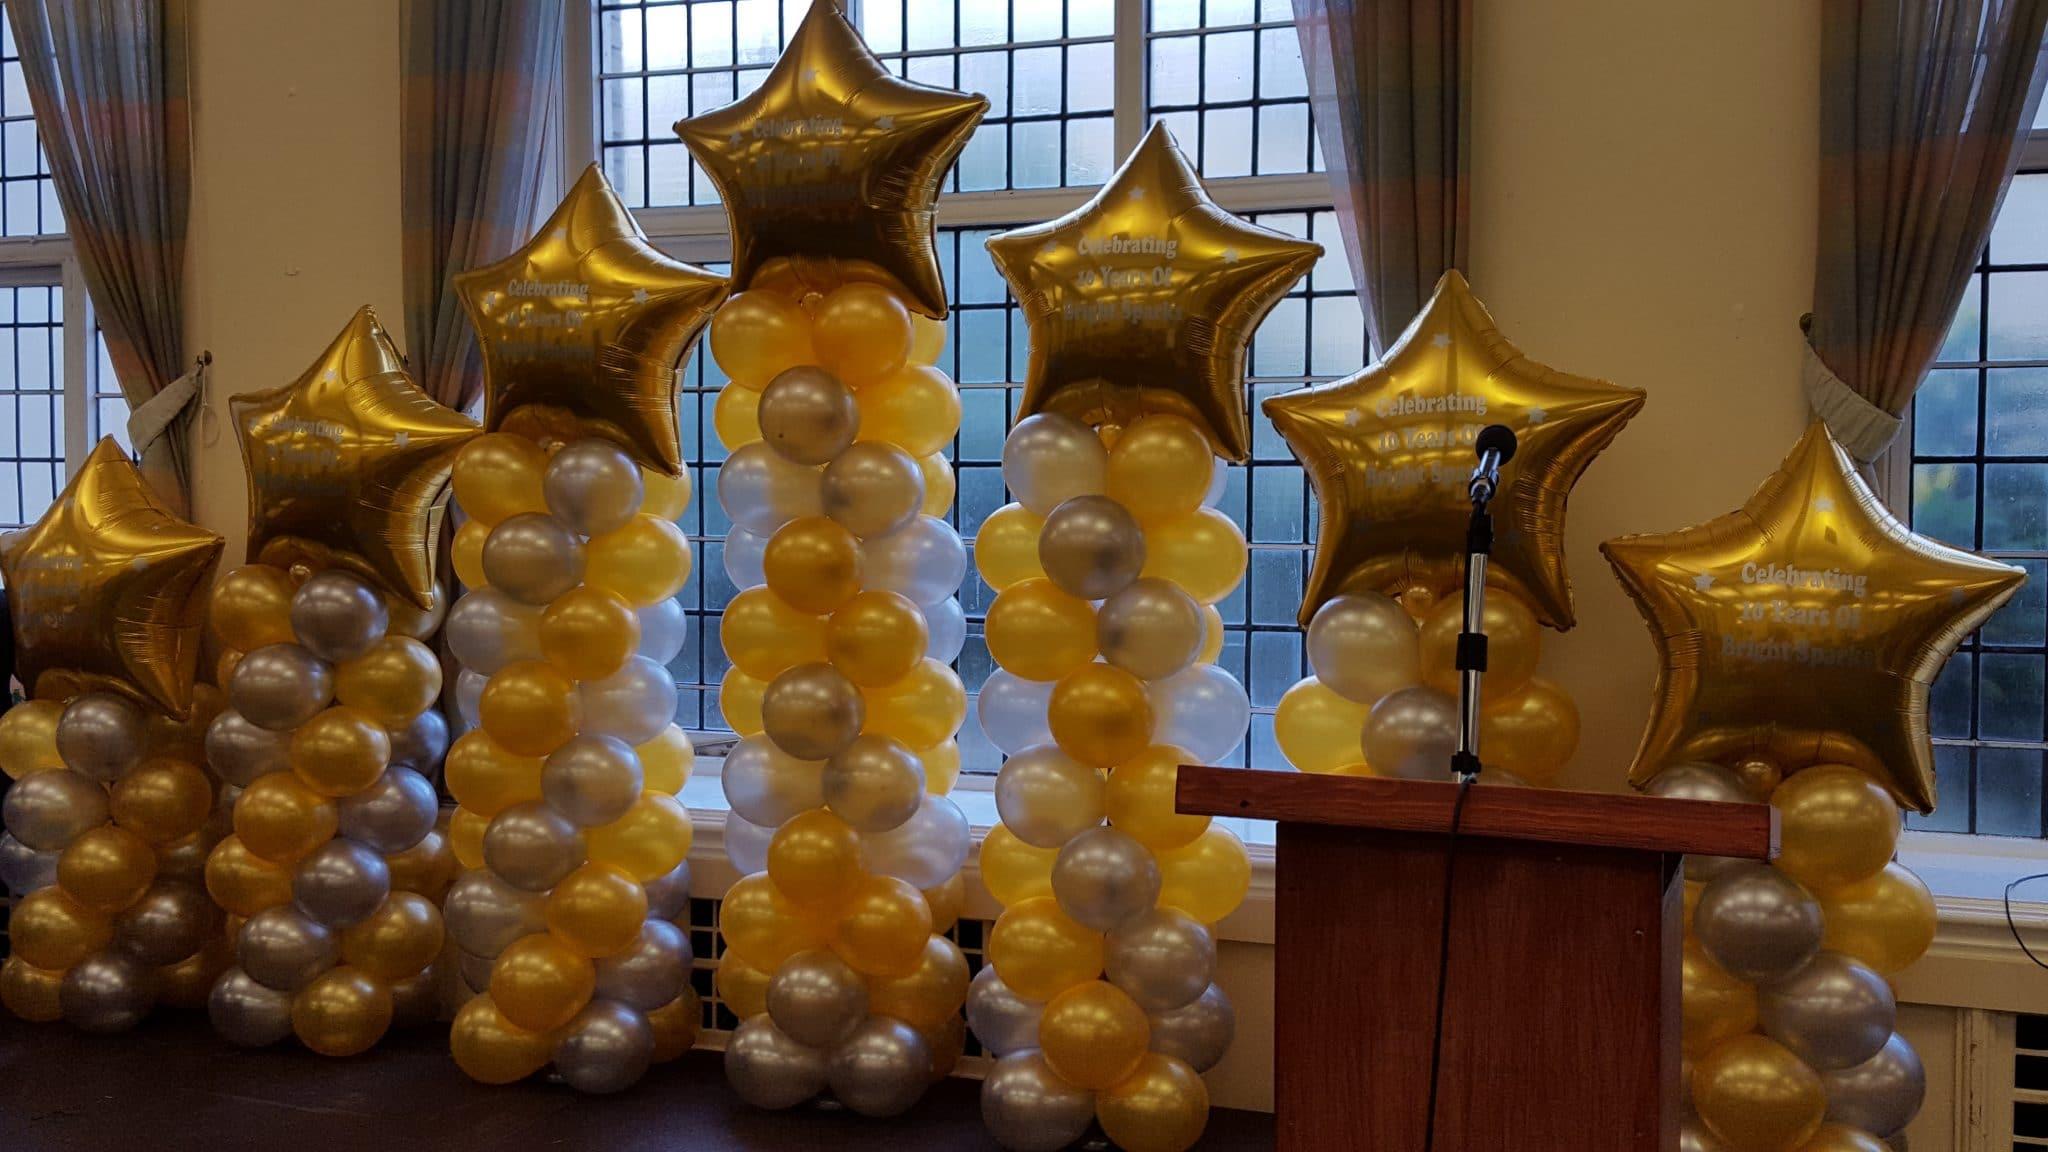 Cardiff Balloons Providing Balloons In Swansea